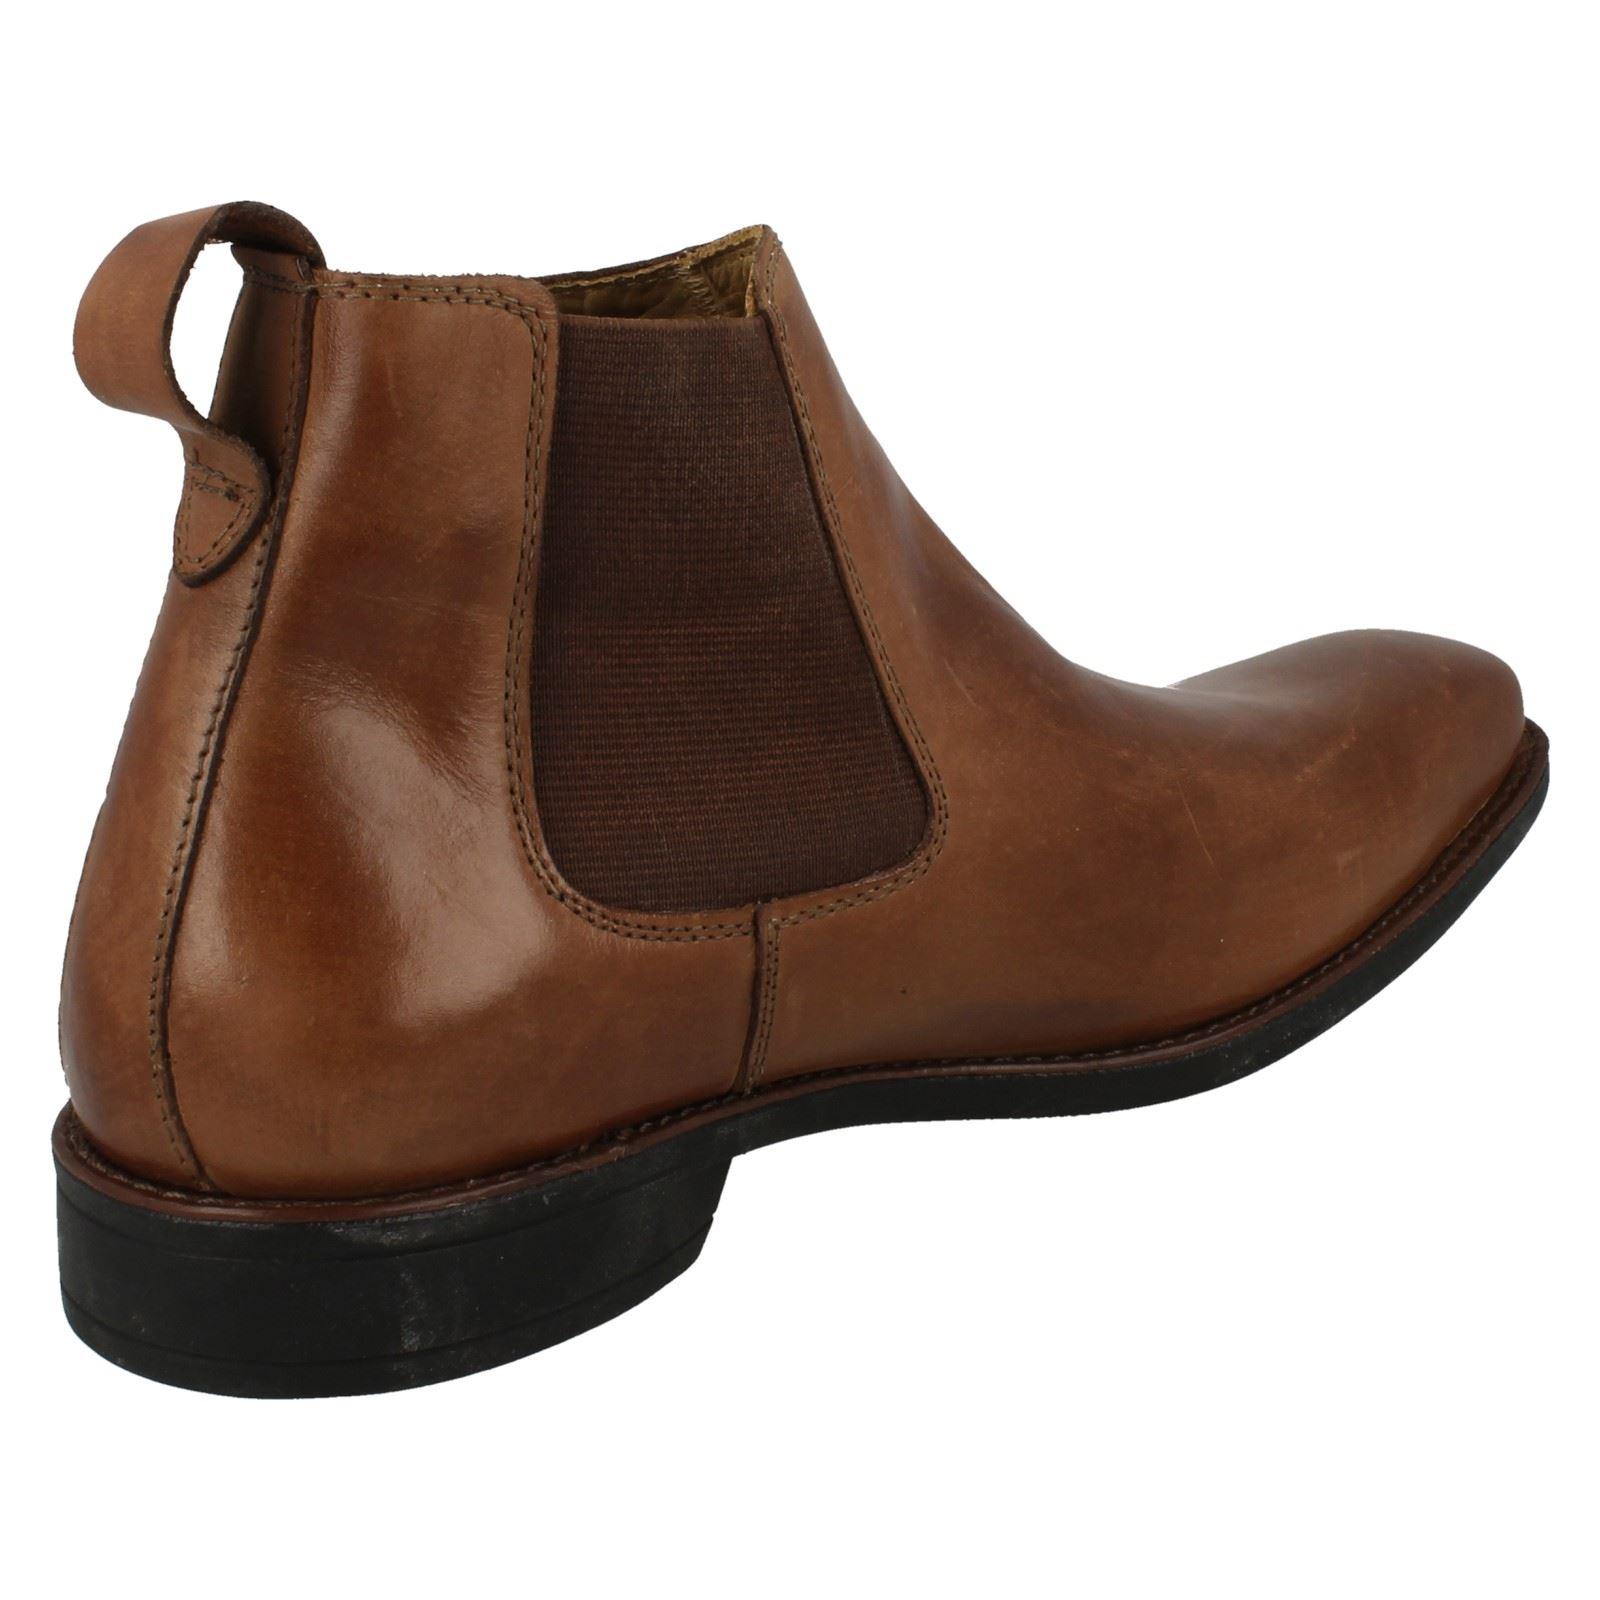 Mens-Anatomic-Chelsea-Boots-039-929211LB-039 thumbnail 14